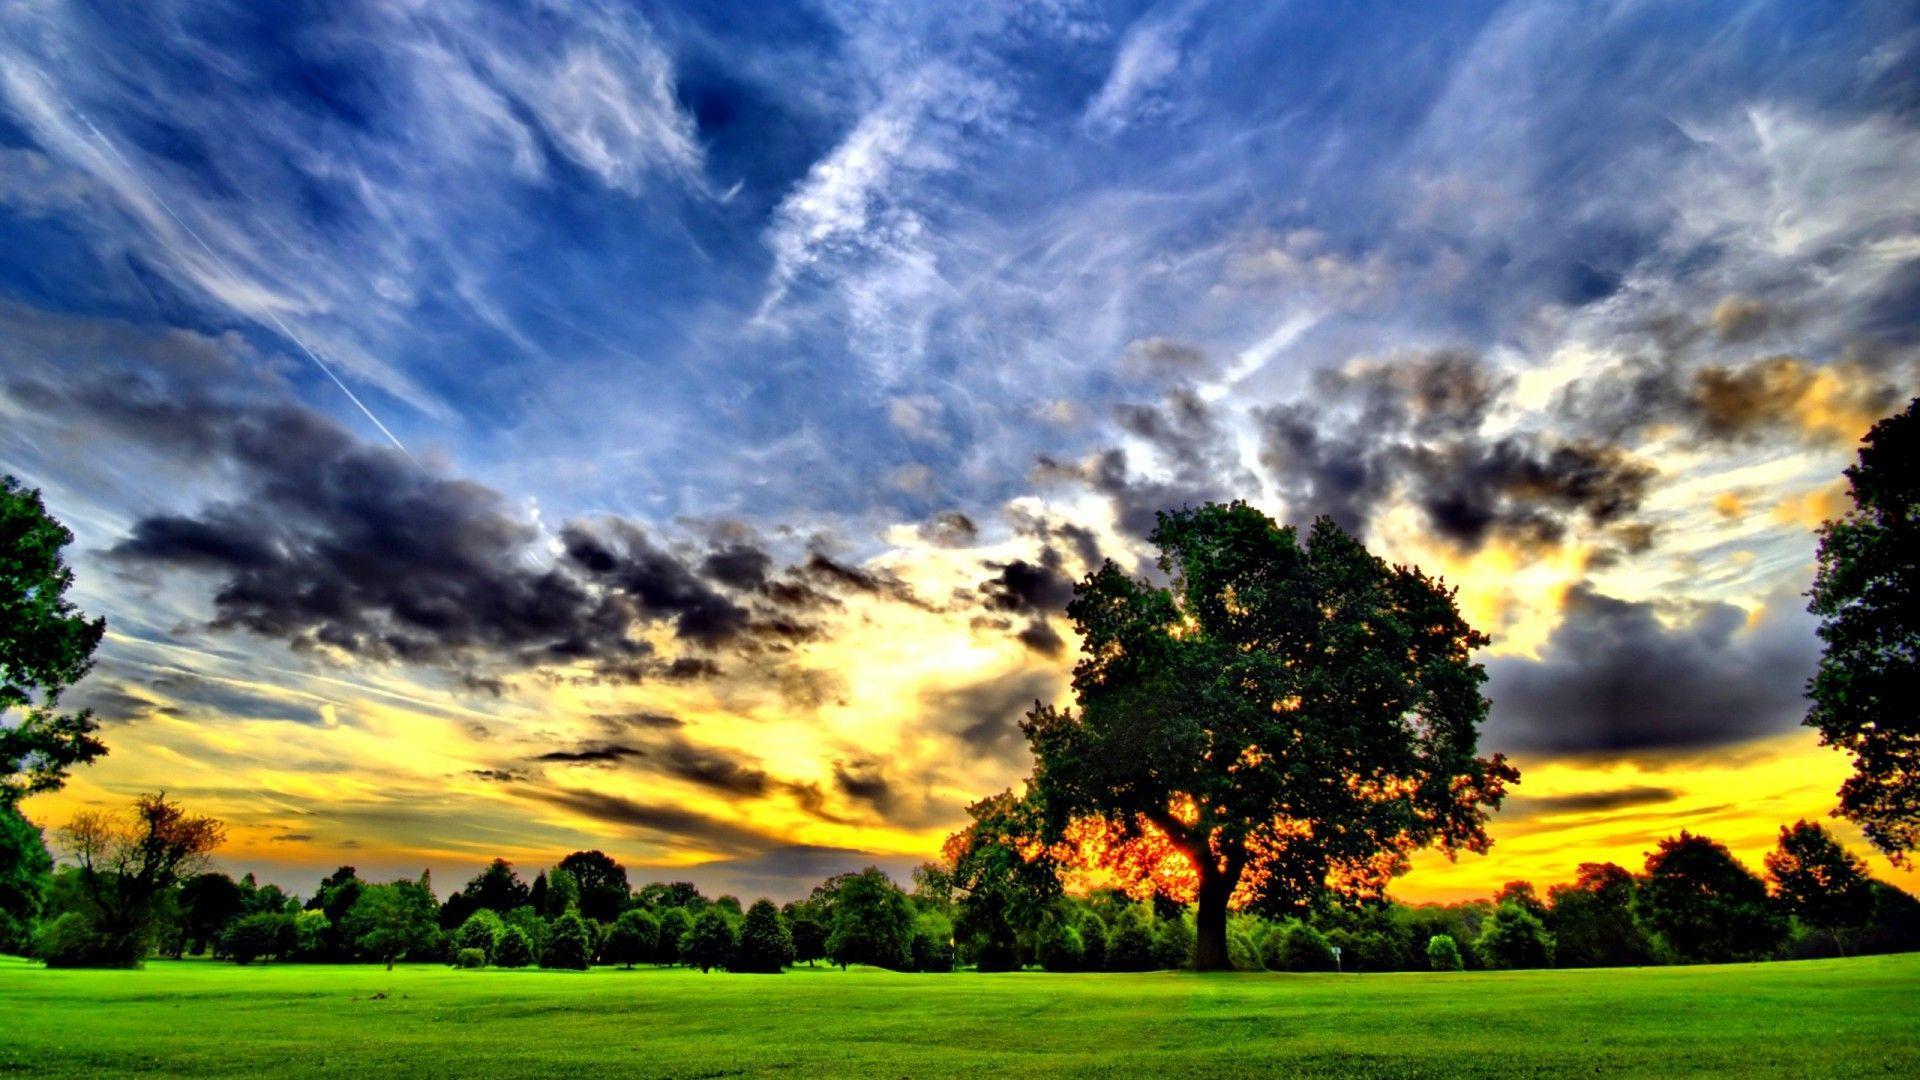 Scenic Landscape Wallpapers Top Free Scenic Landscape